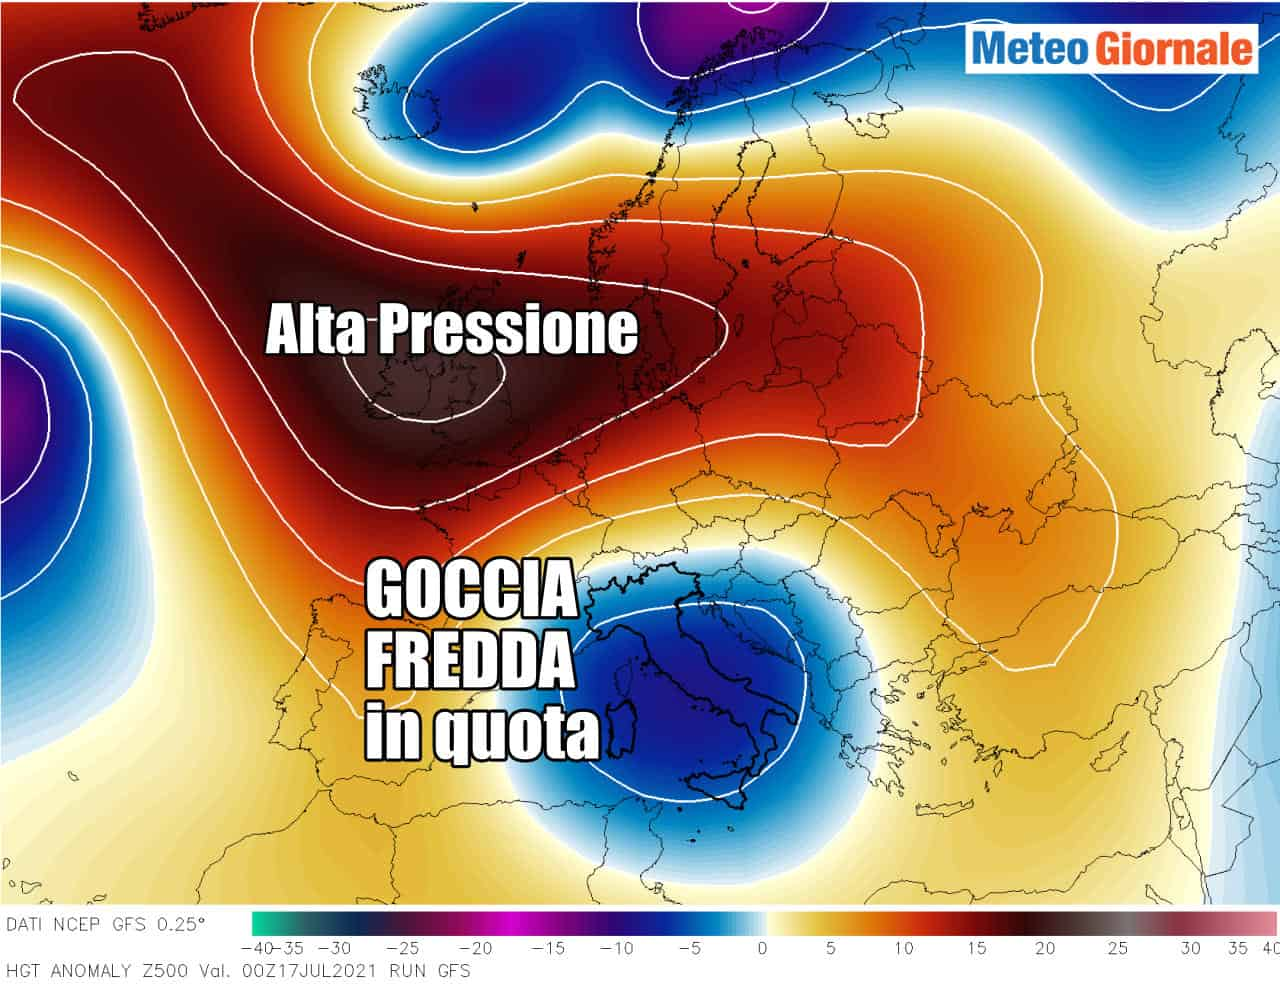 situazione meteo 2 - Allerta meteo Protezione Civile in numerose Regioni d'Italia